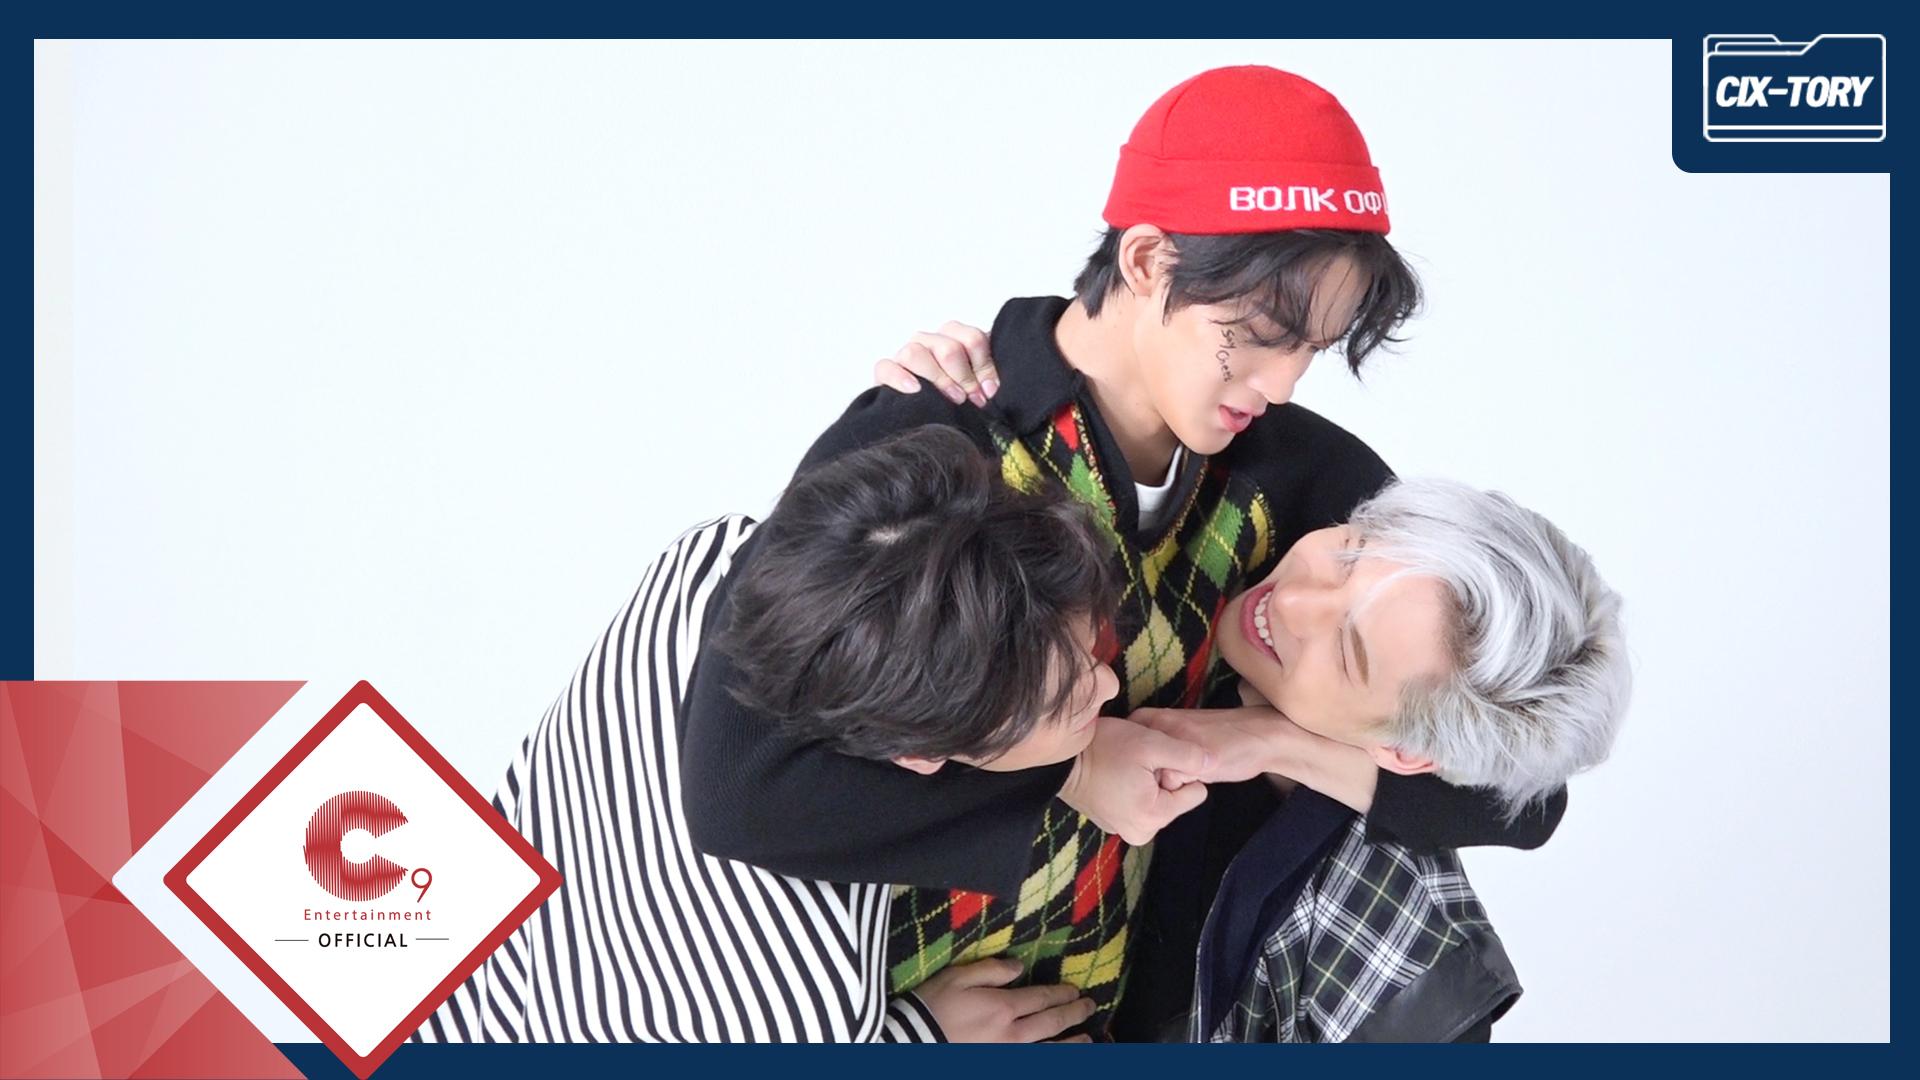 [CIX-tory] STORY.29 나일론(NYLON KOREA) 1월호 화보 촬영 현장